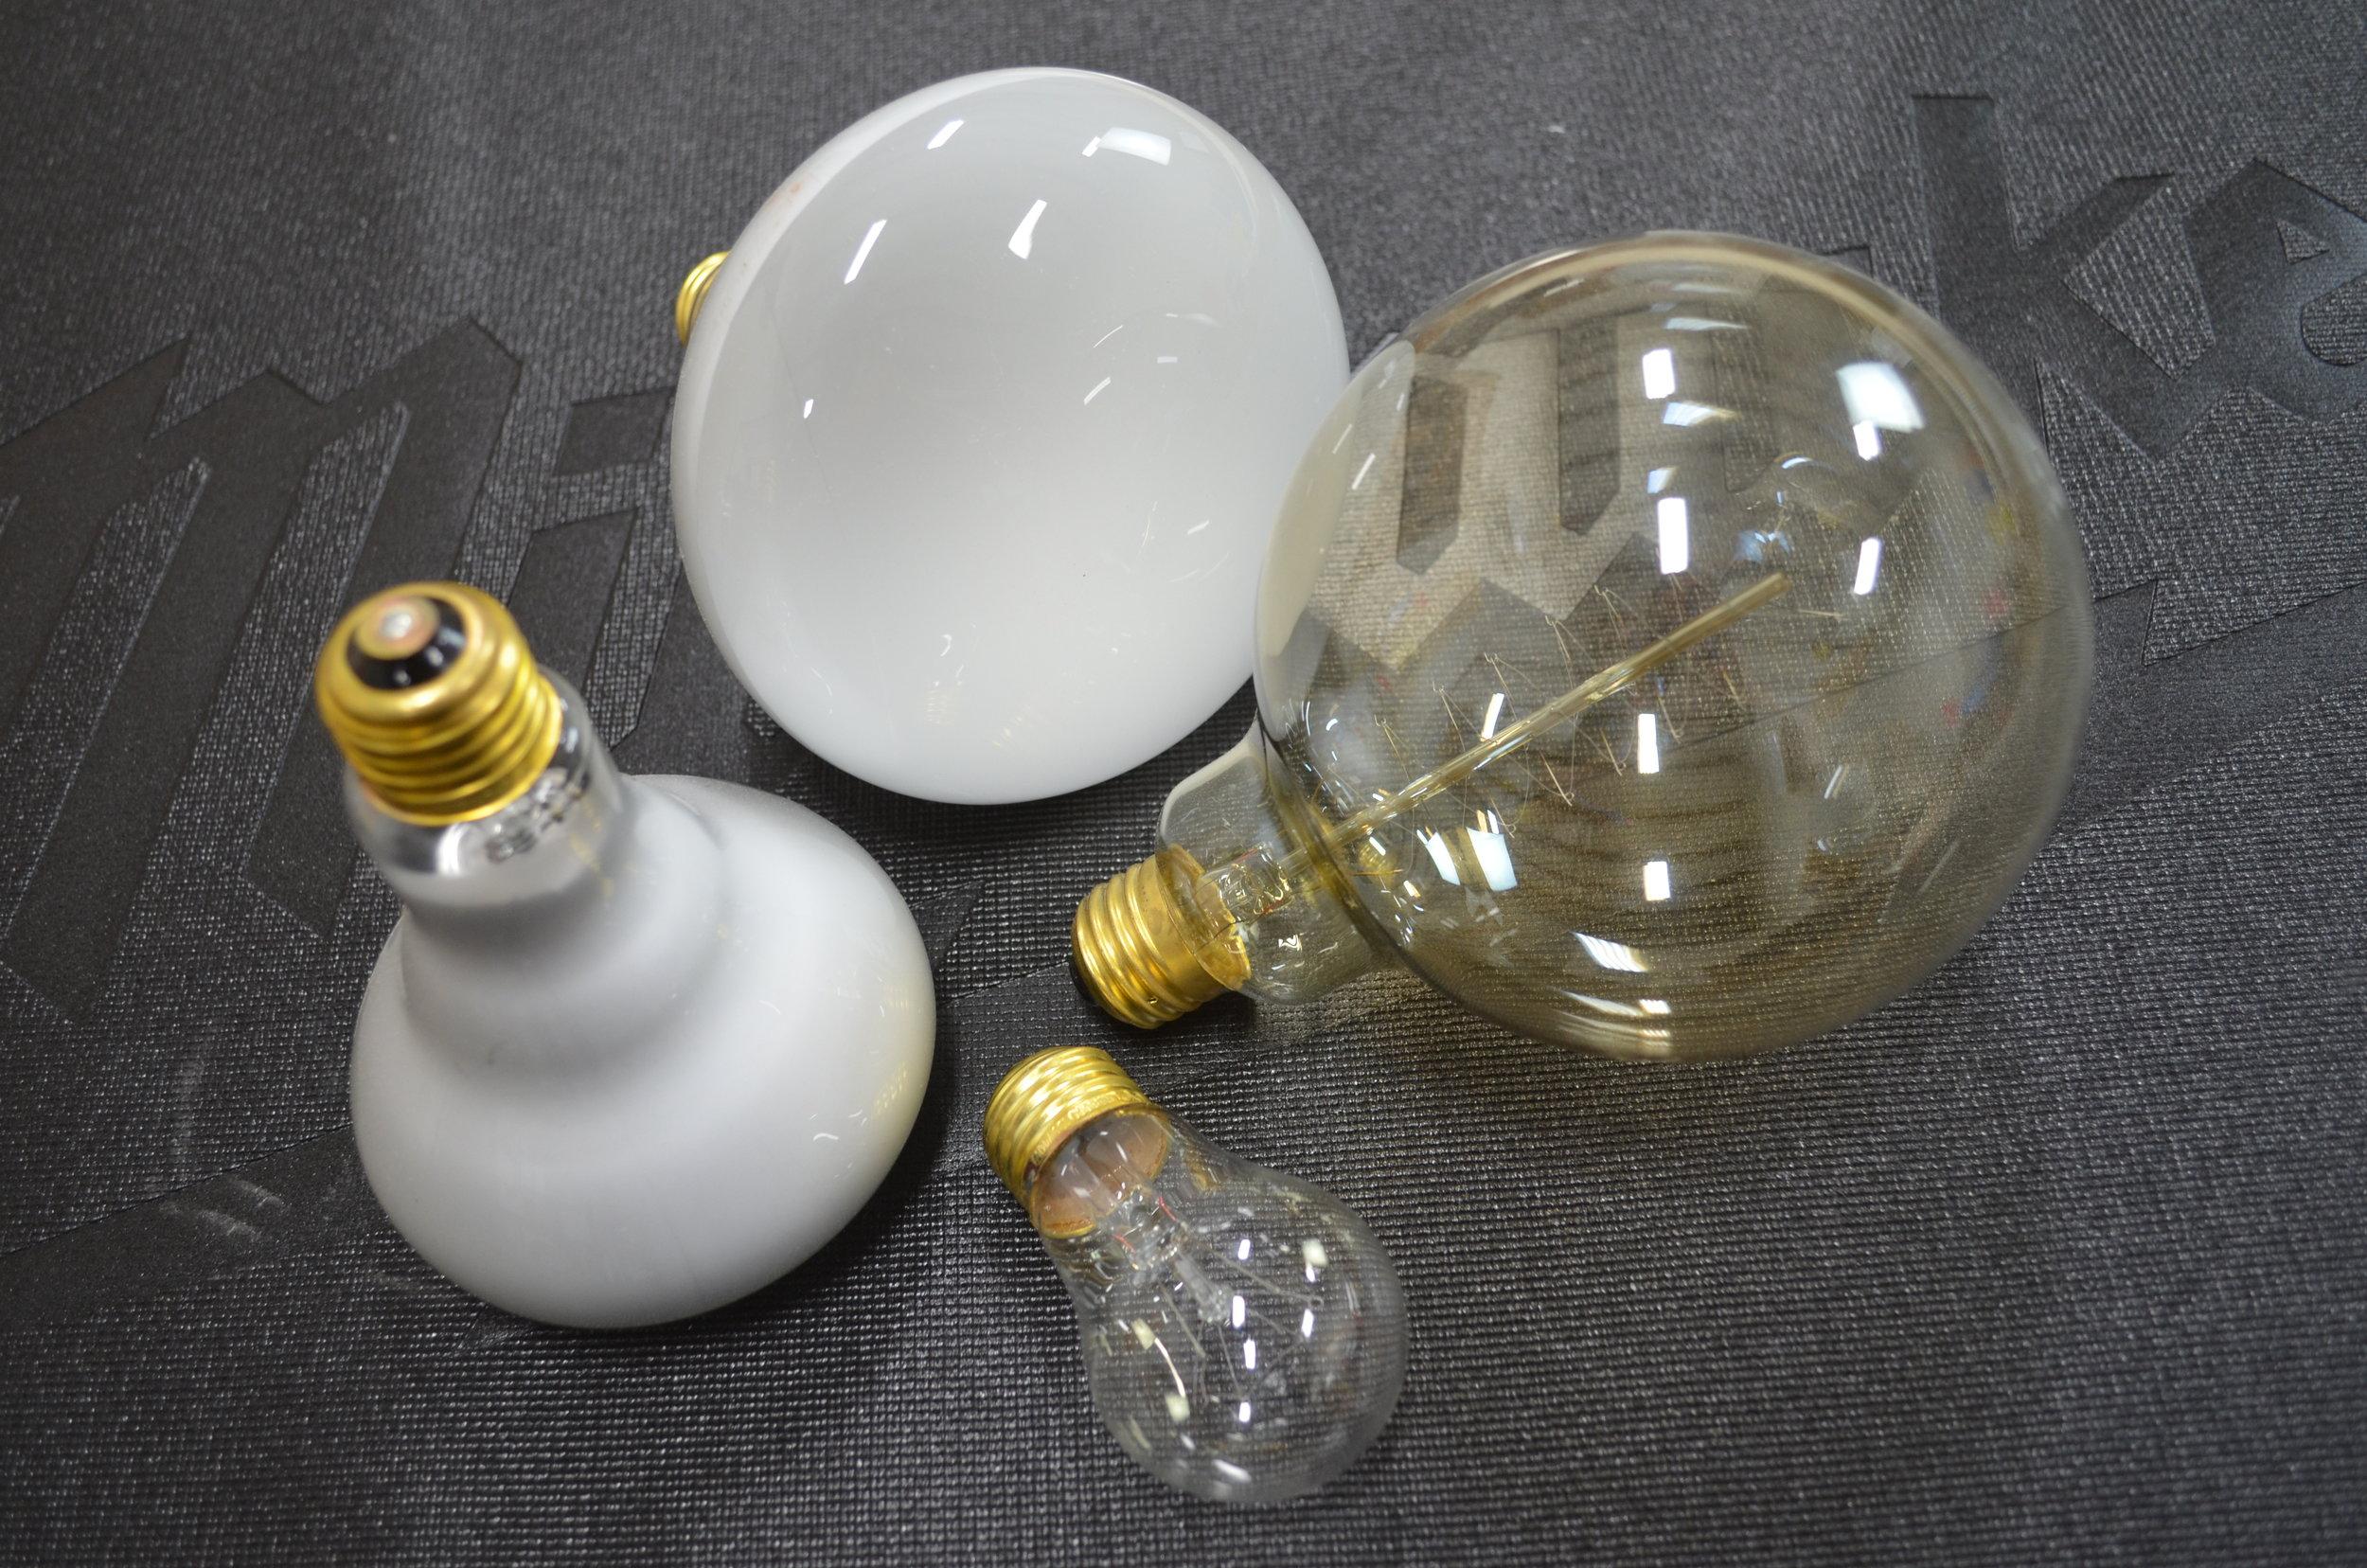 assortment-of-incandescent-lamps-bulbs